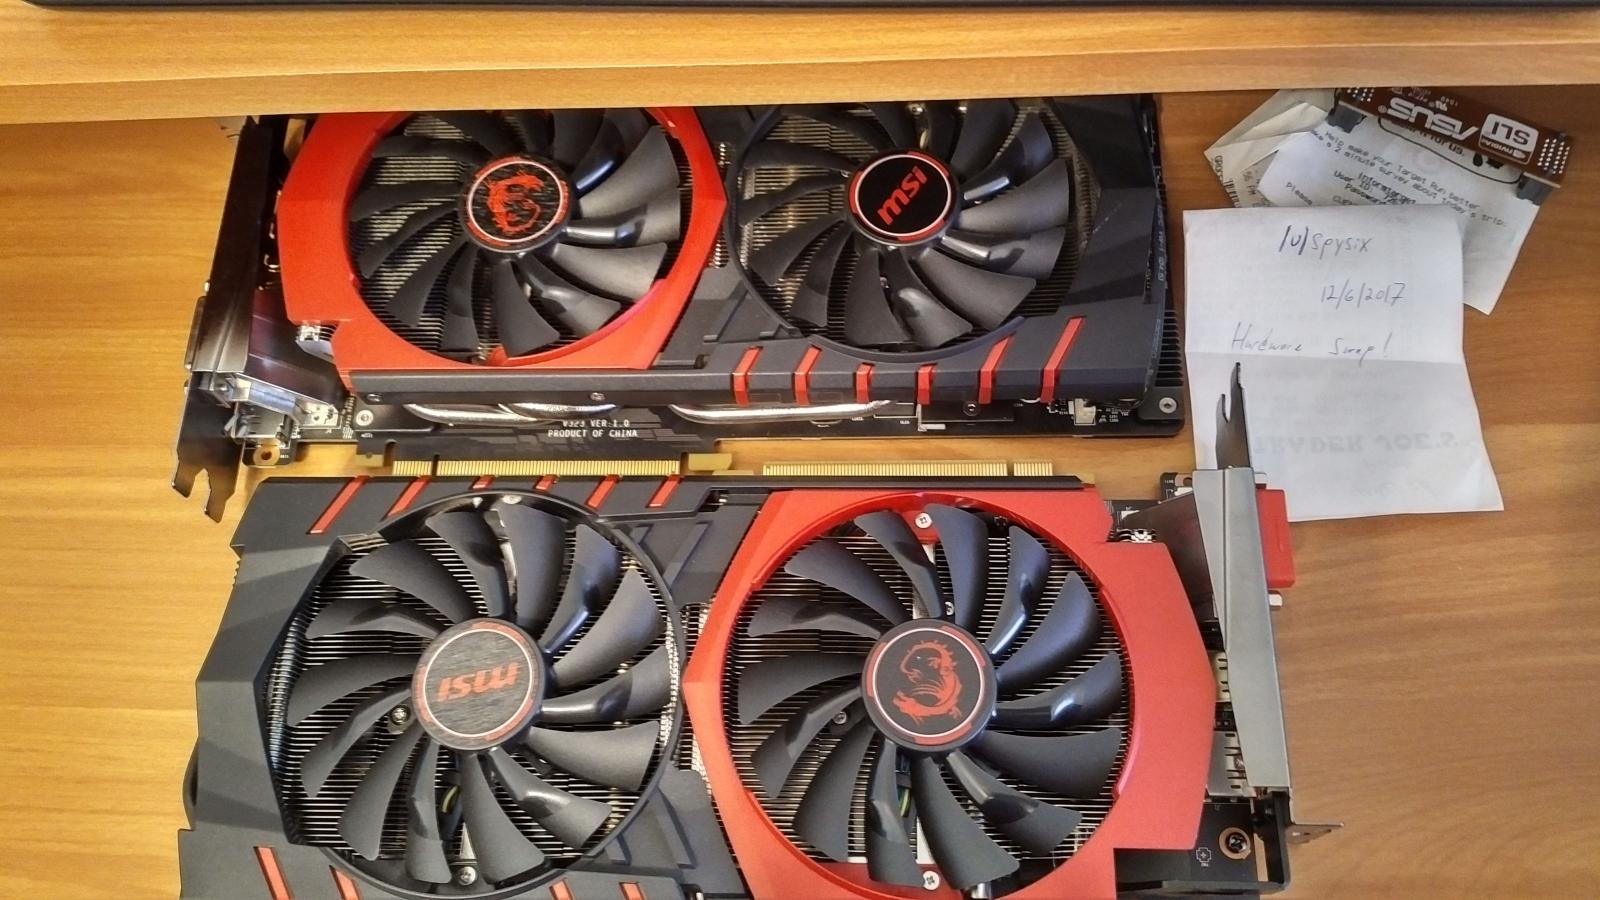 Photo of Nvidia MSI Geforce GTX 980 ti + Free Destiny 2 code